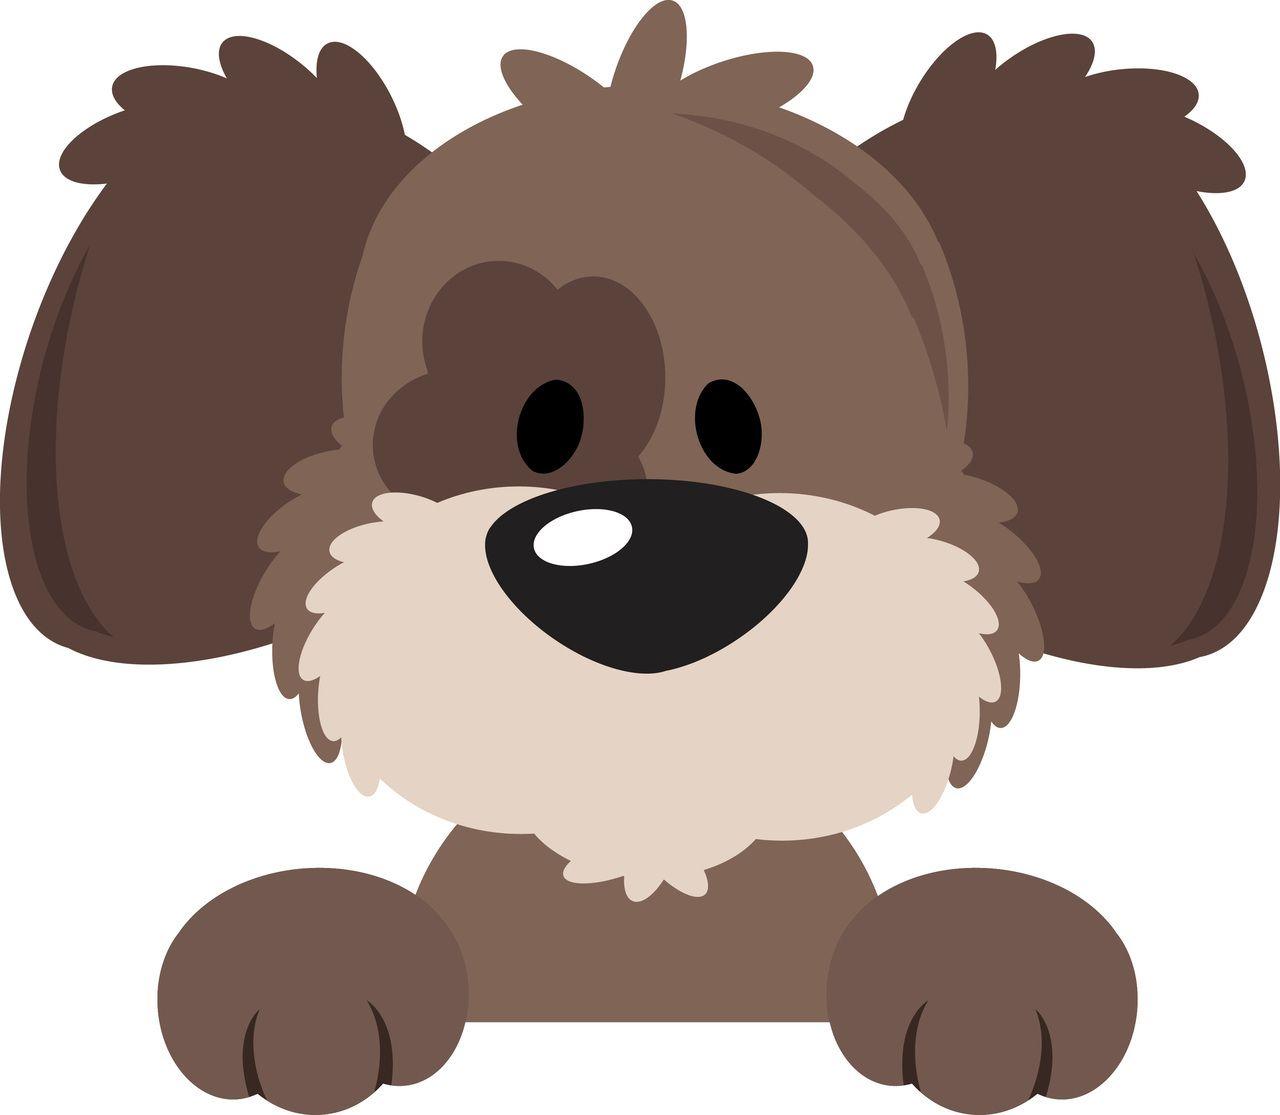 1280x1115 Cute Dog Clipart Cute Dog Clipart Backgrounds